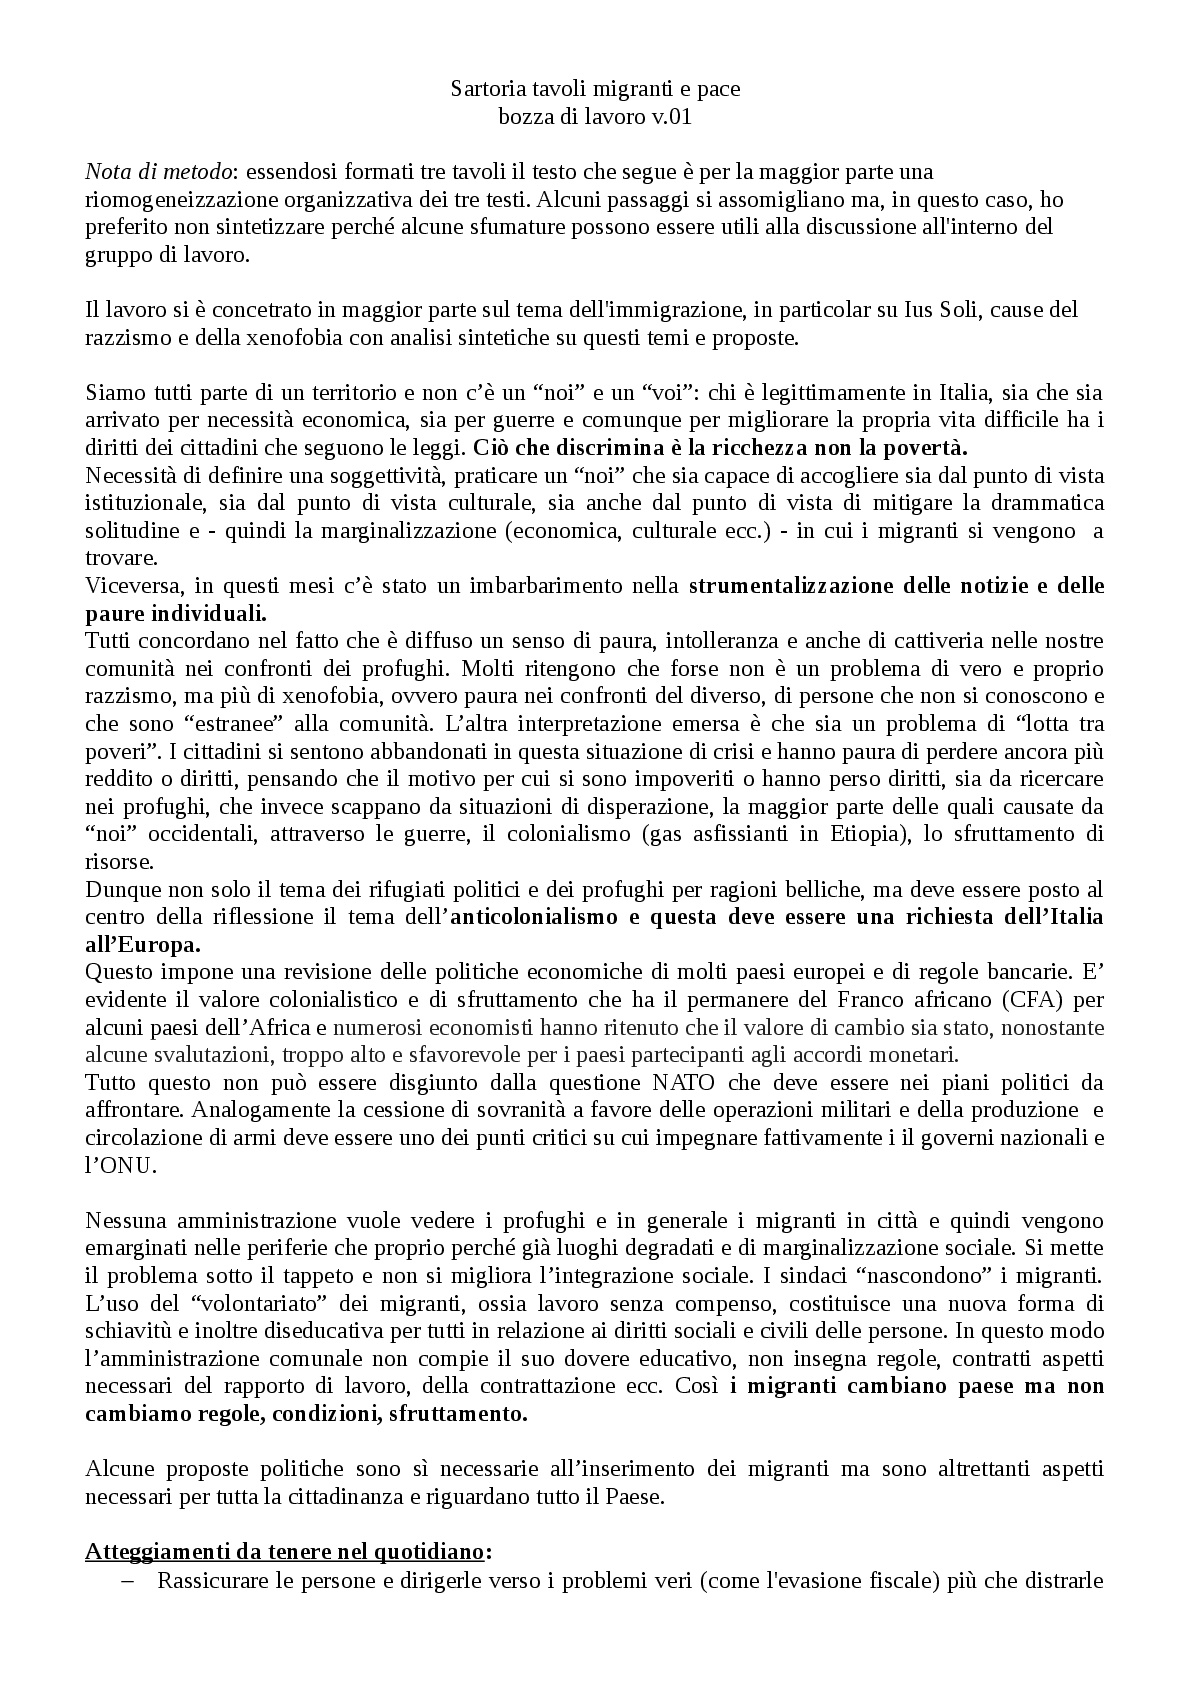 sartoria_migranti_pace_01-001